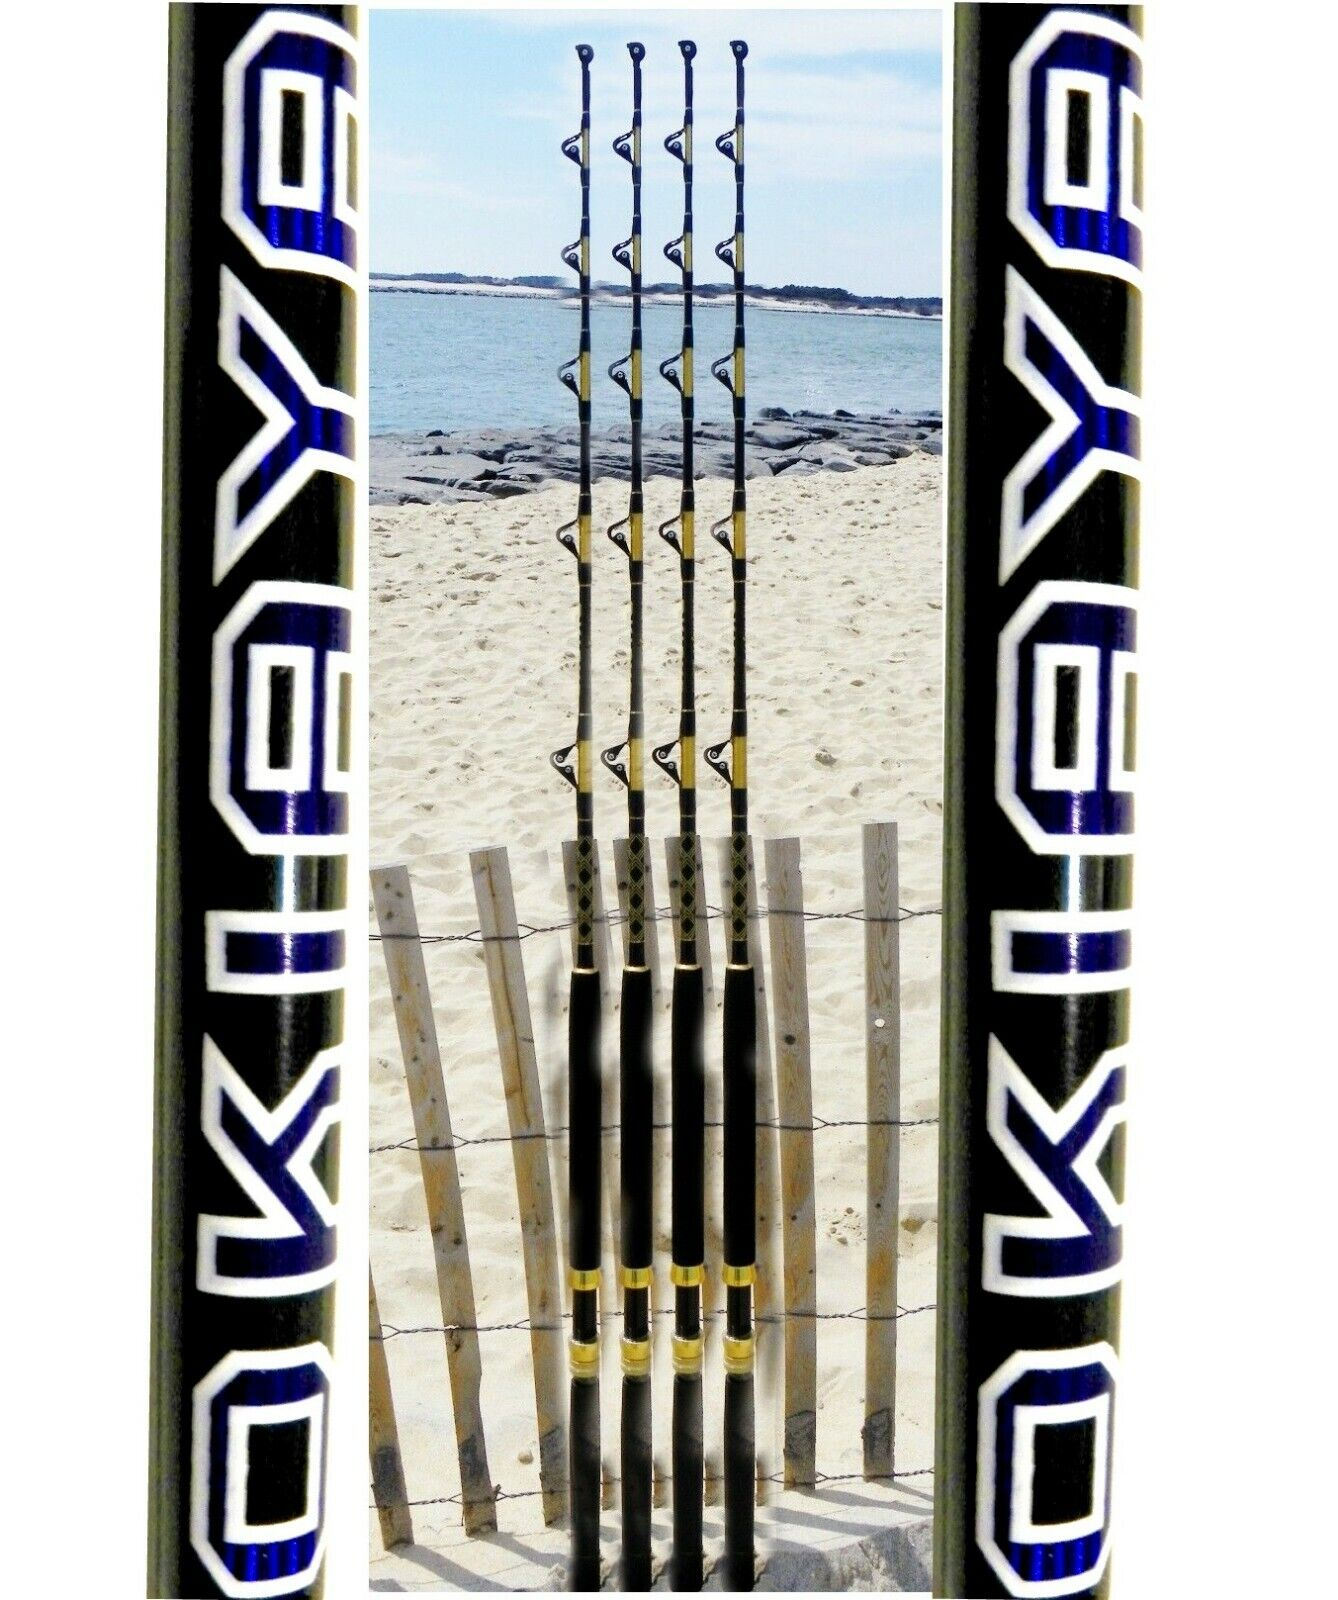 Okiaya Composit 30-50lb Agua Salada Grandes Juego Roller Rod Set De 4